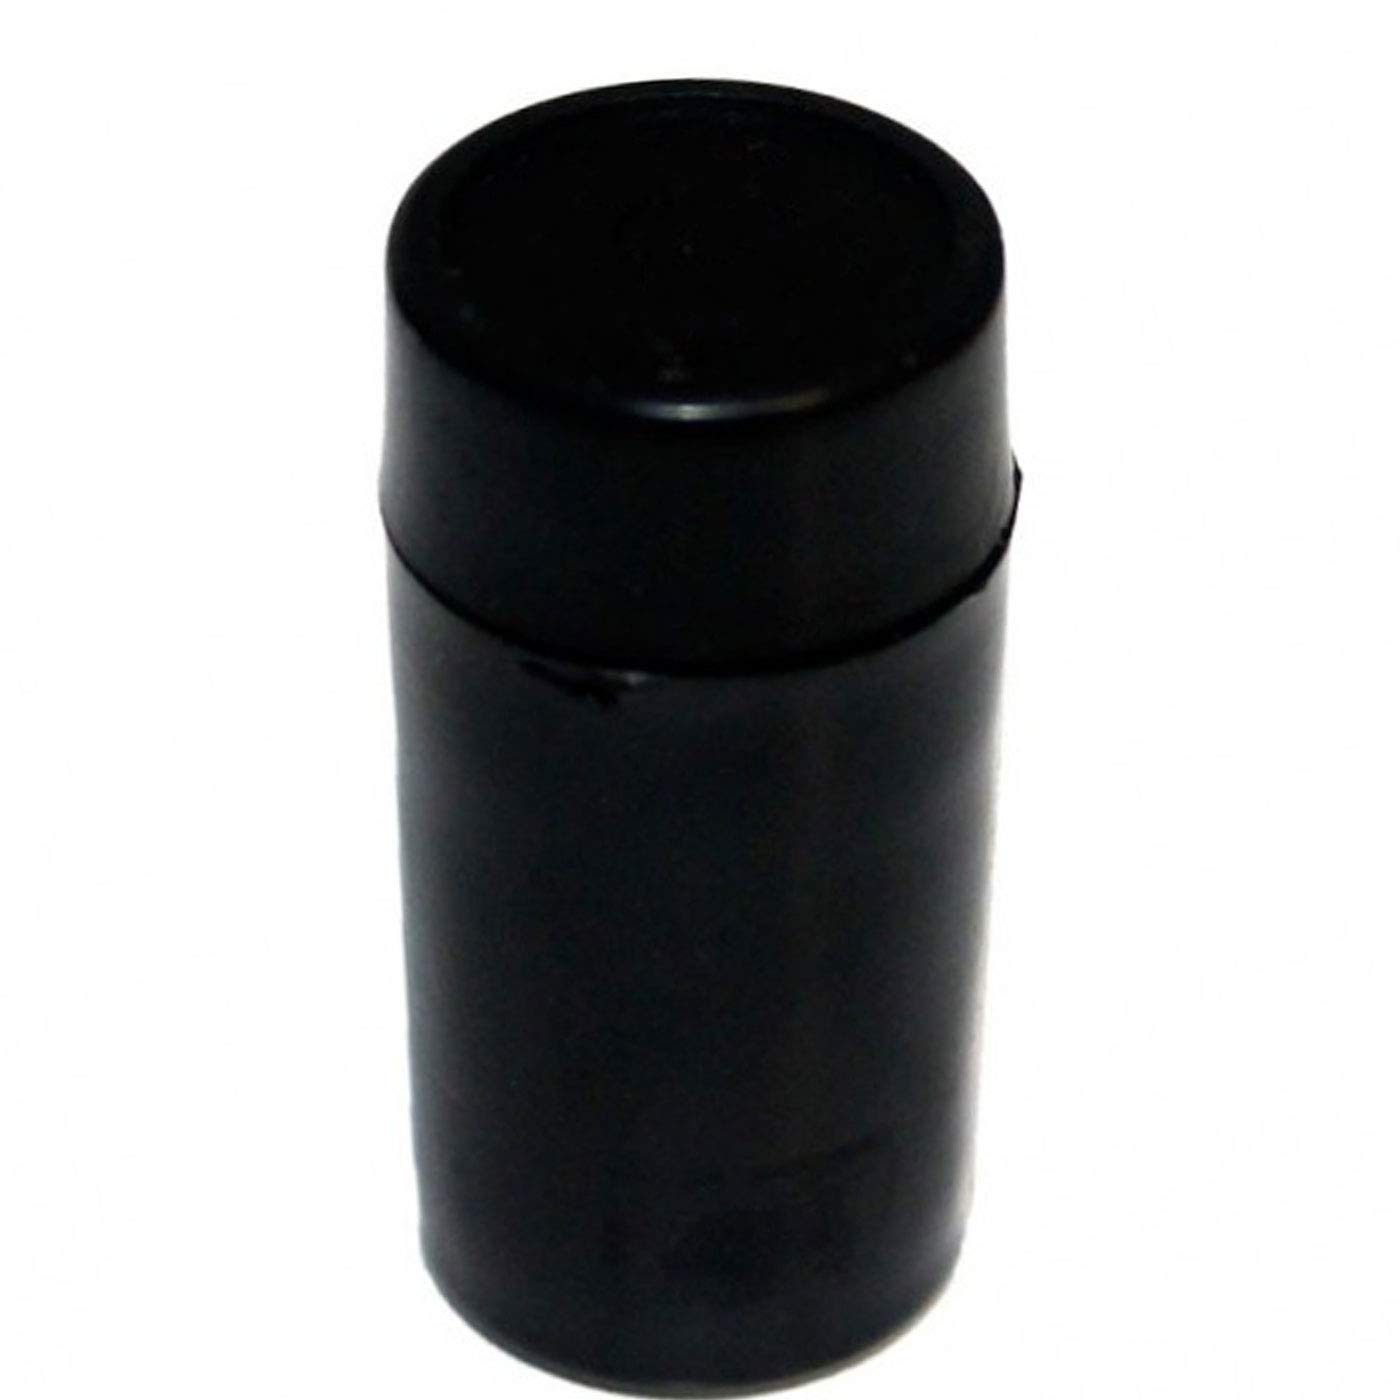 Acan Bote de Tinta de 20 mm para máquina etiquetadora: Amazon.es ...